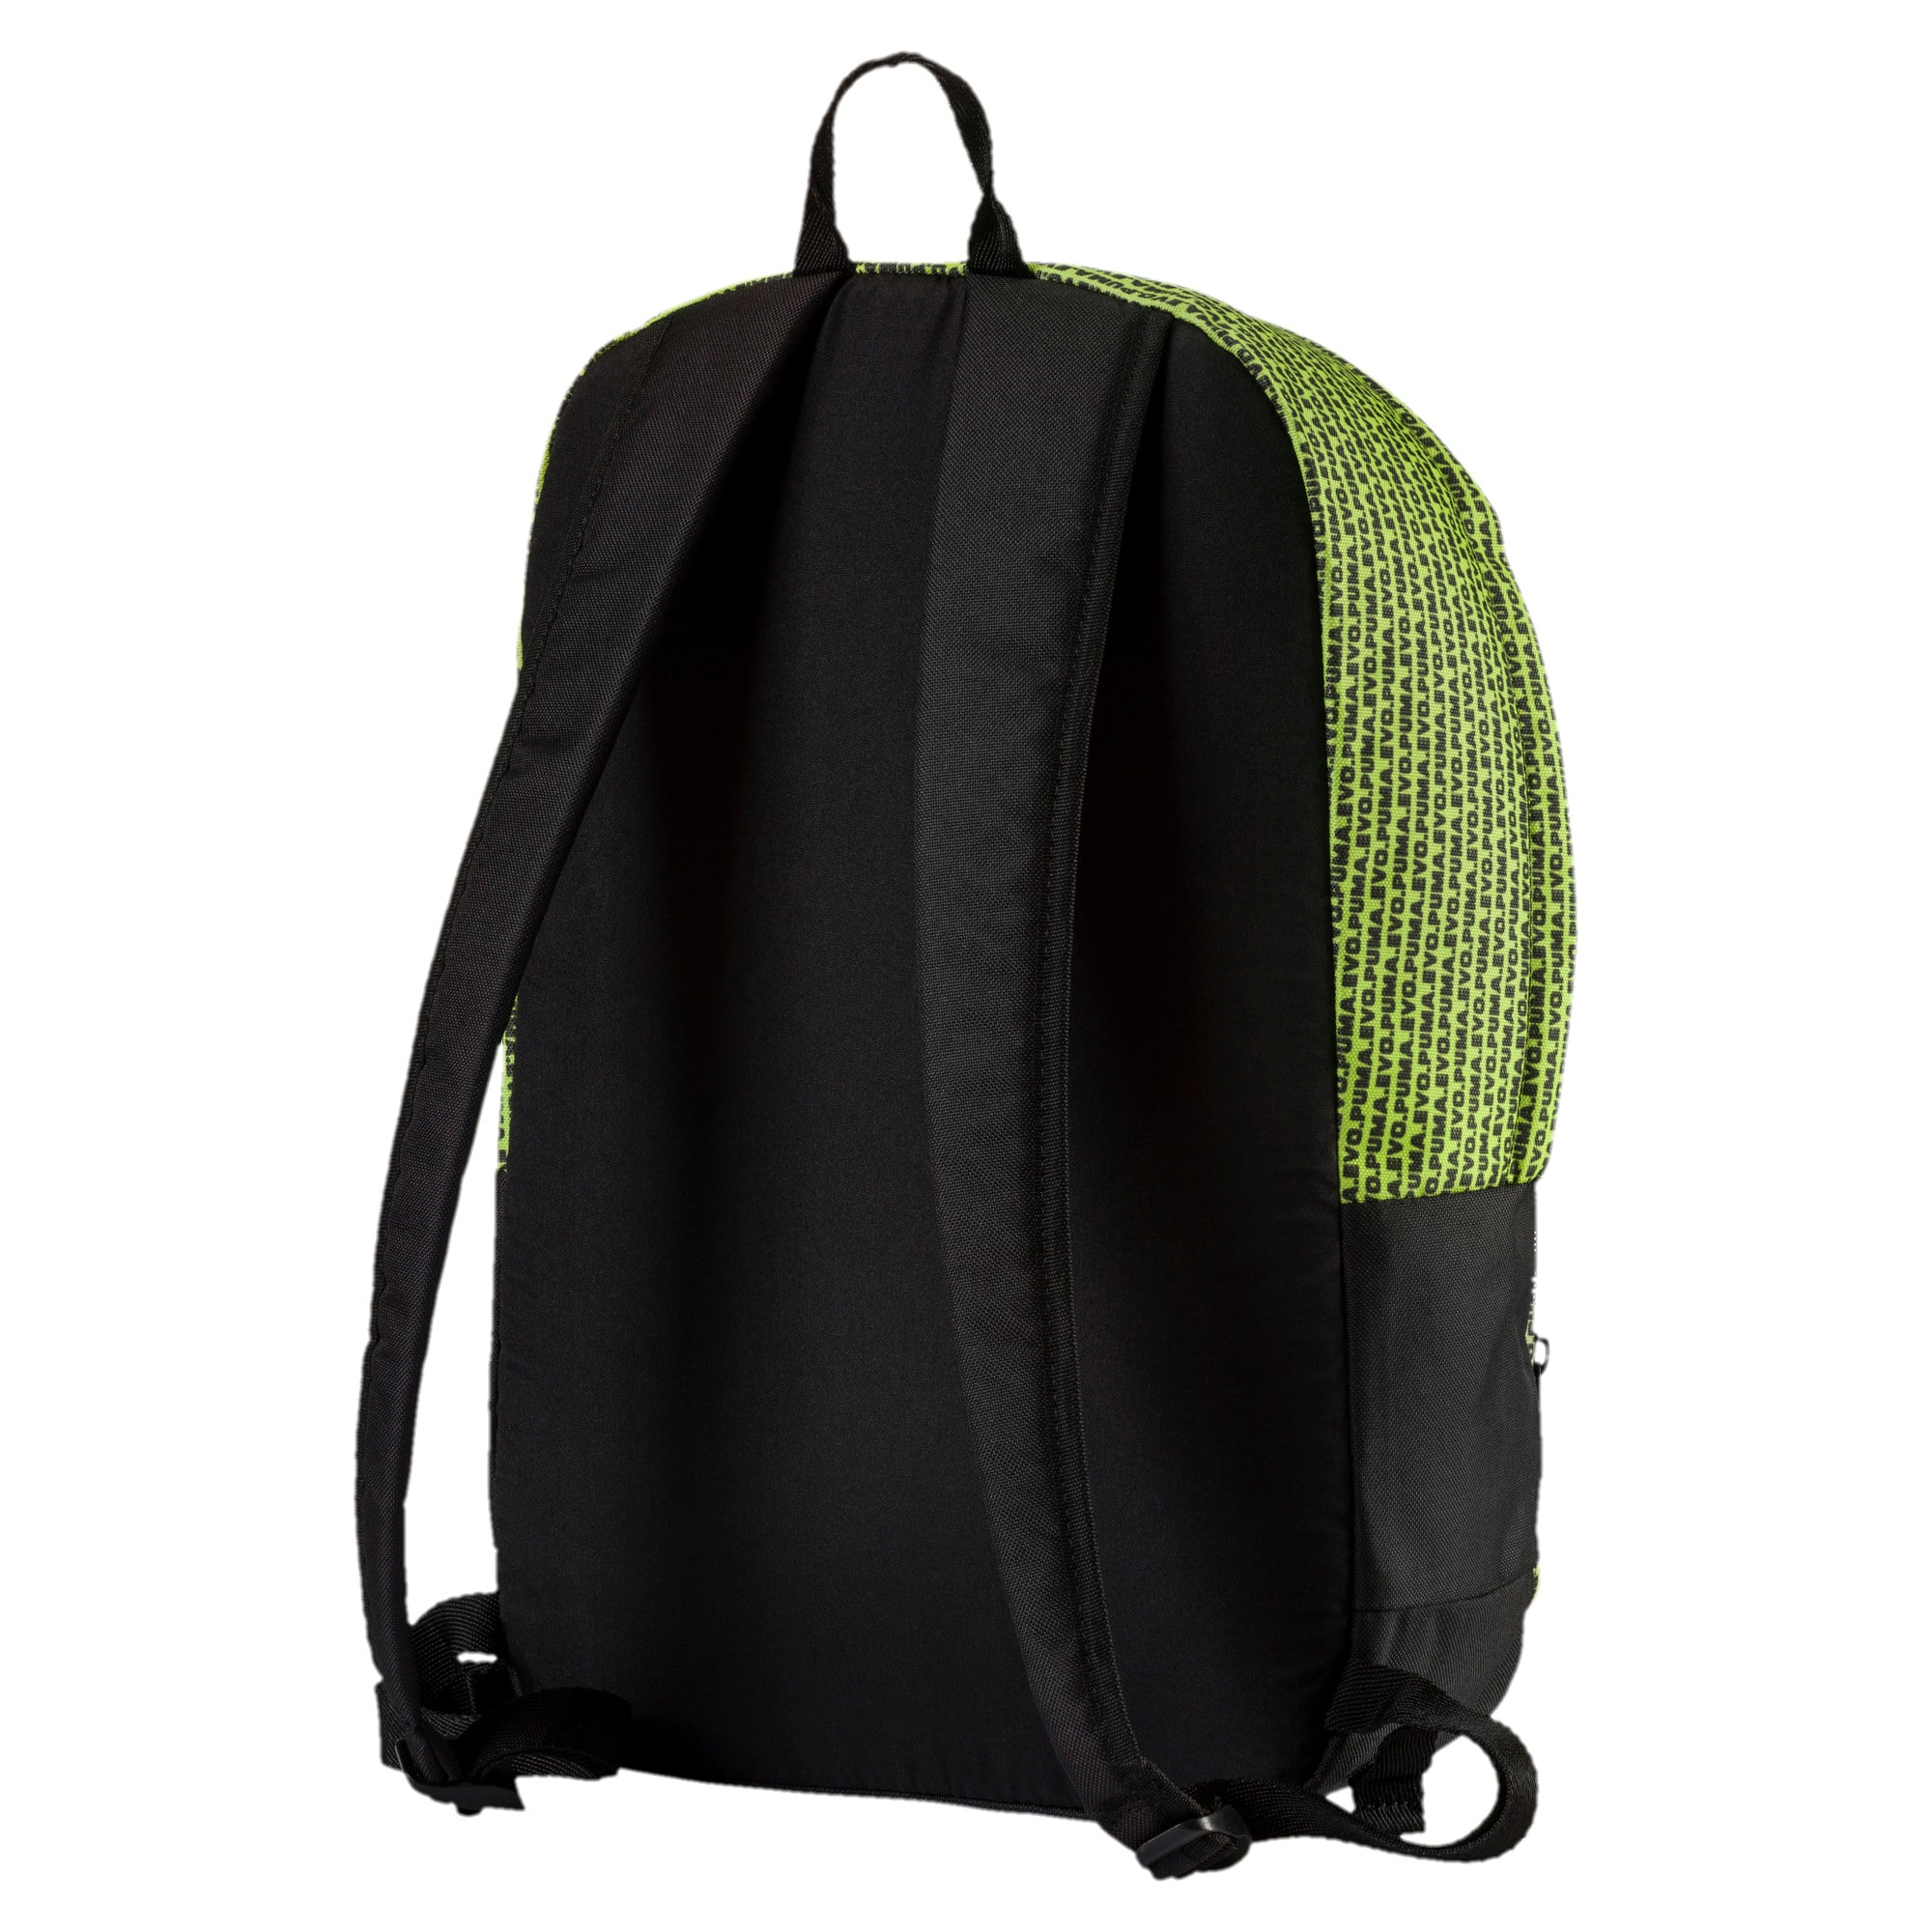 Thumbnail 2 of Prime Backpack, Puma Black-Evo graphic, medium-IND